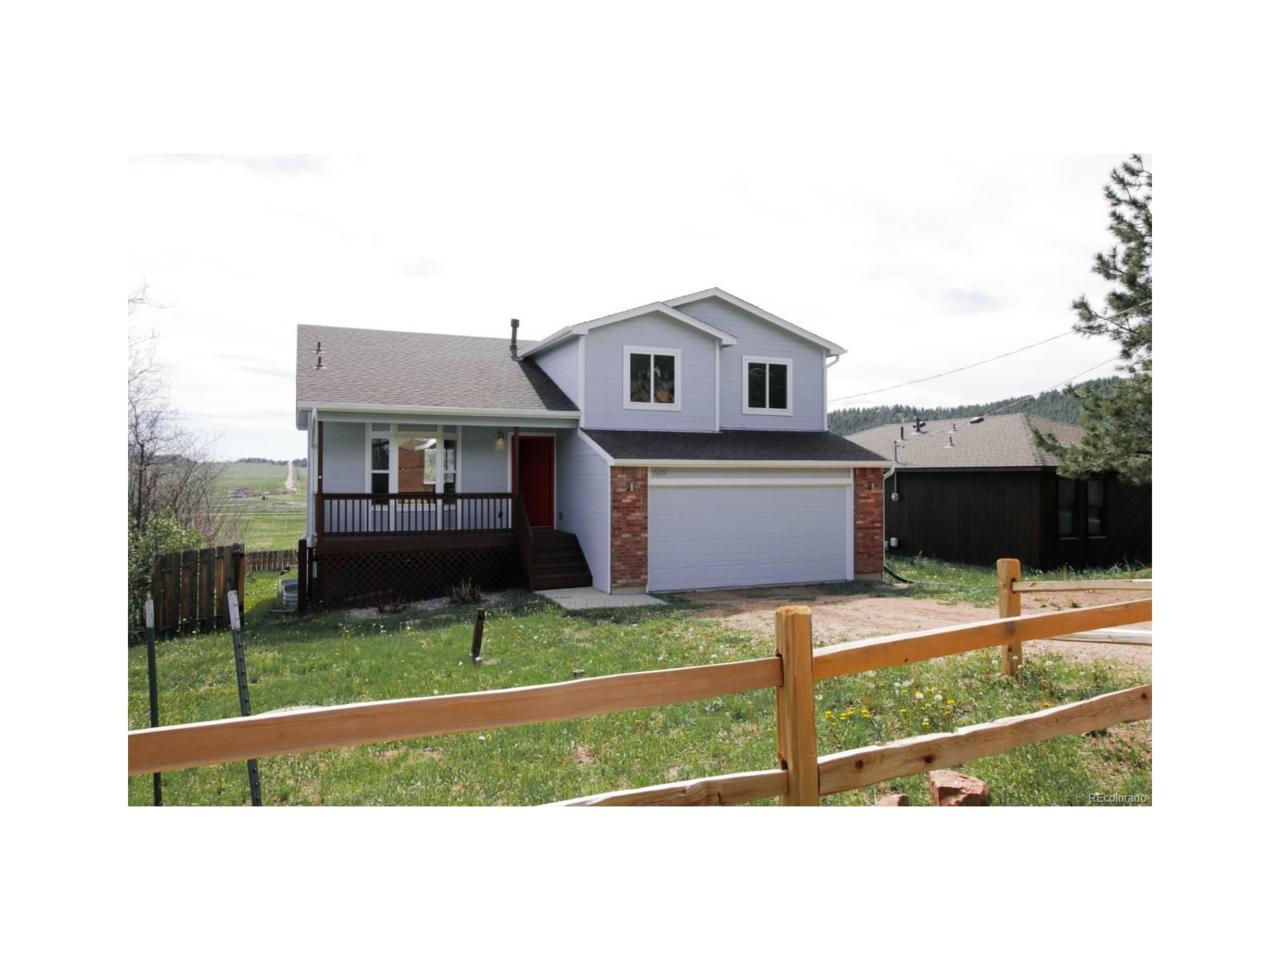 609 N Academy Road, Palmer Lake, CO 80133 (MLS #4365378) :: 8z Real Estate